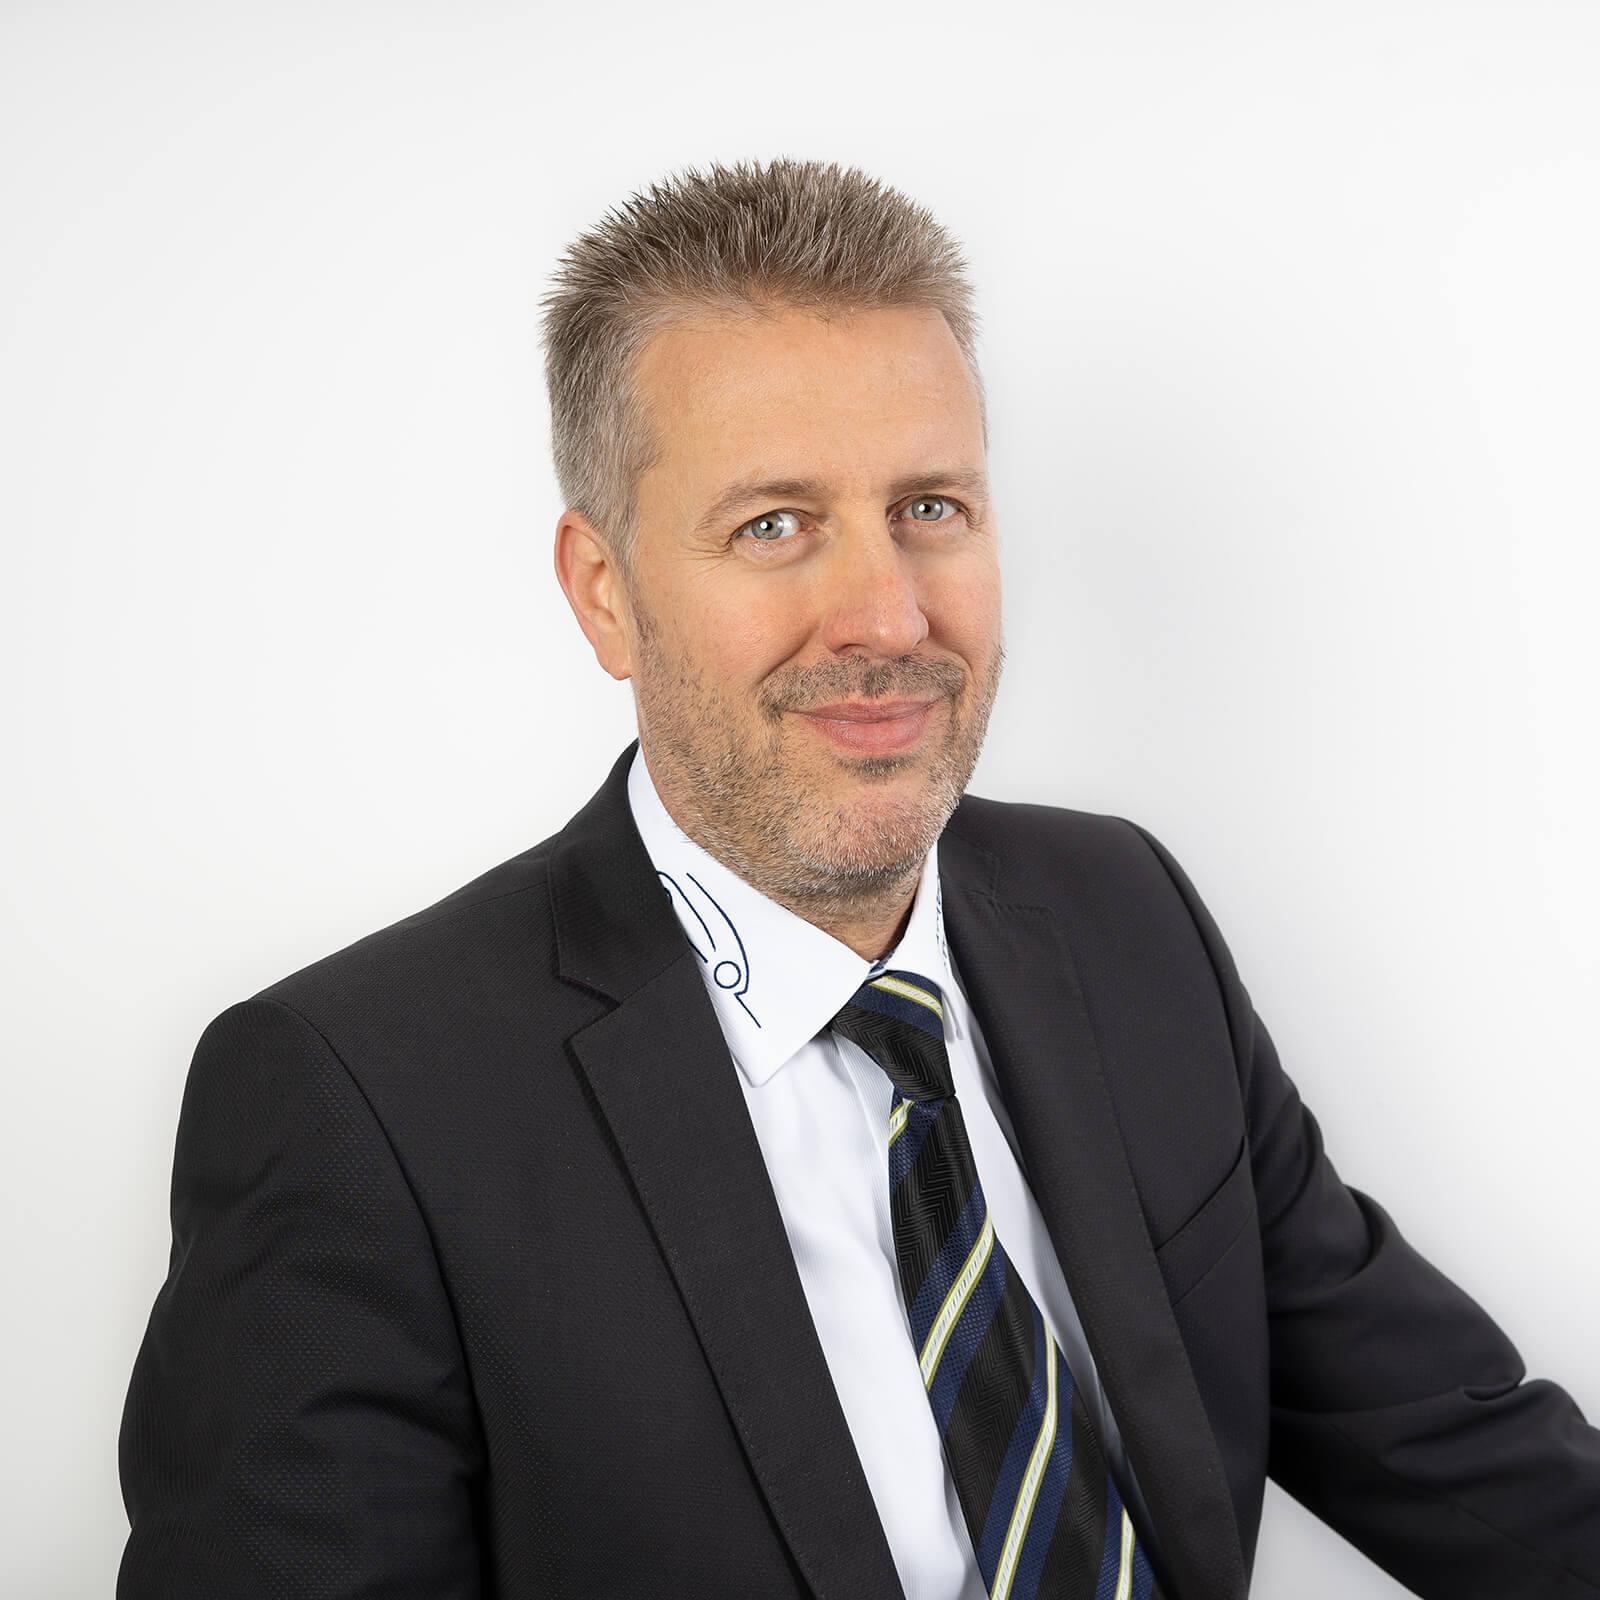 Herr Stefan Straußberger